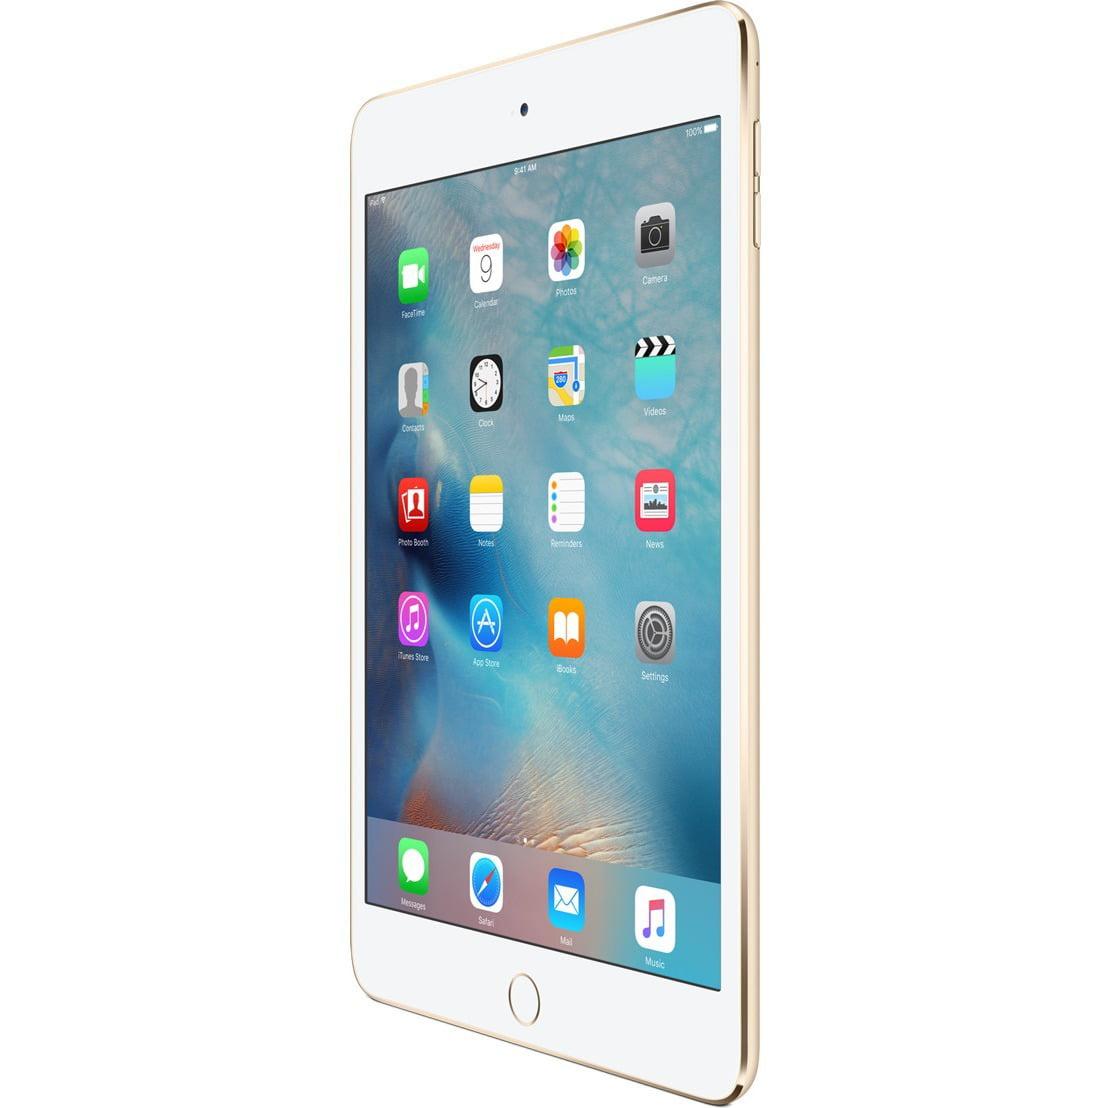 iPad mini 4 Wi-Fi 16GB - Gold